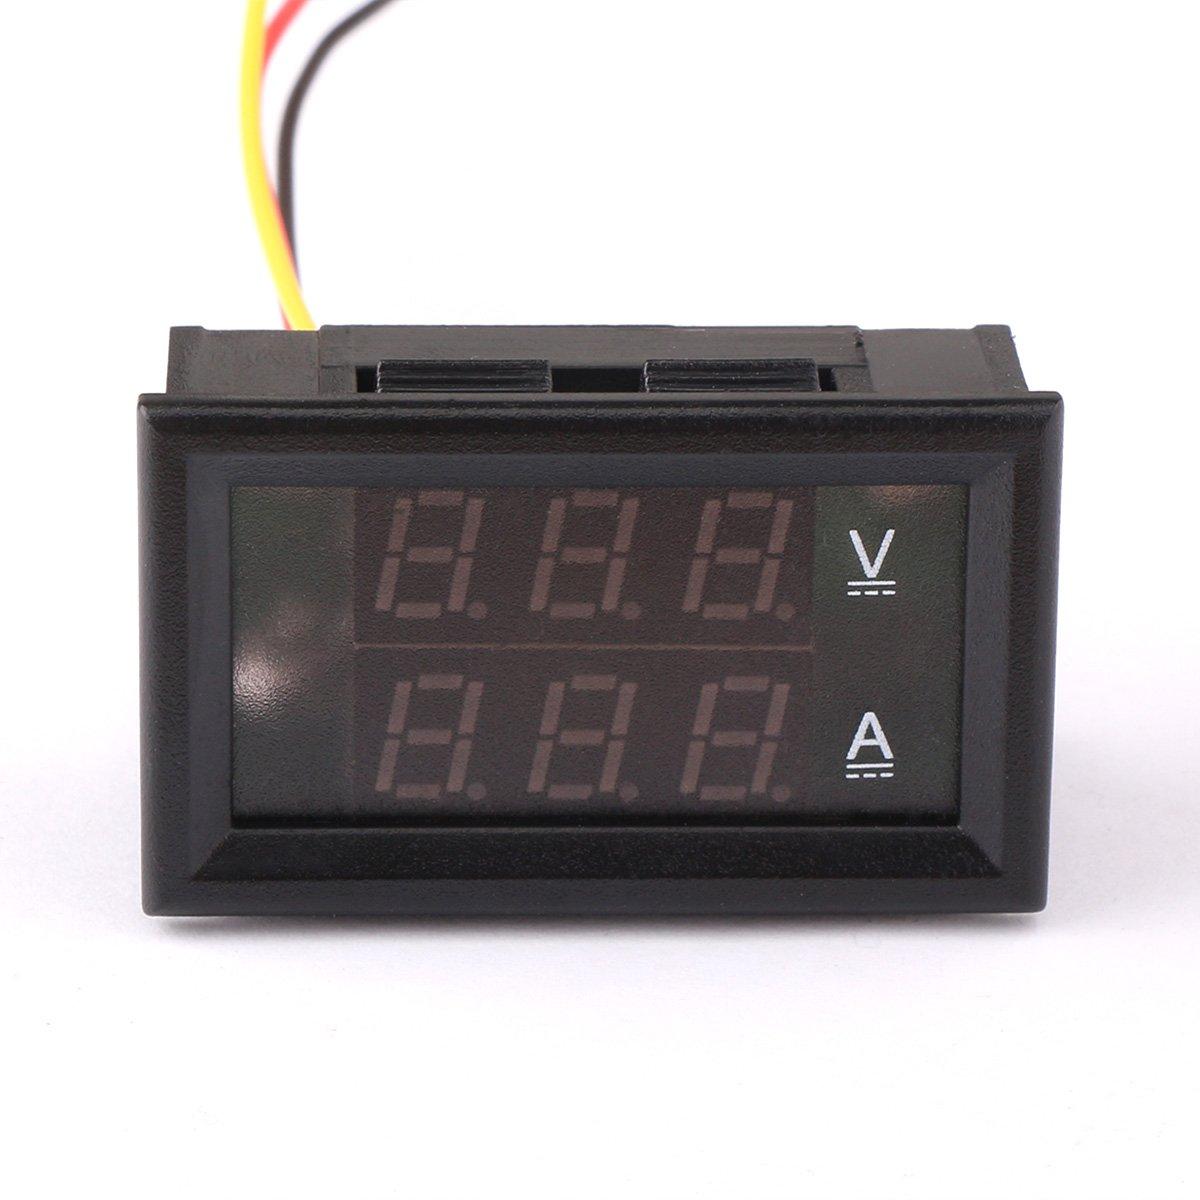 Großzügig 15 Ampere Drahtstärke Fotos - Schaltplan Serie Circuit ...